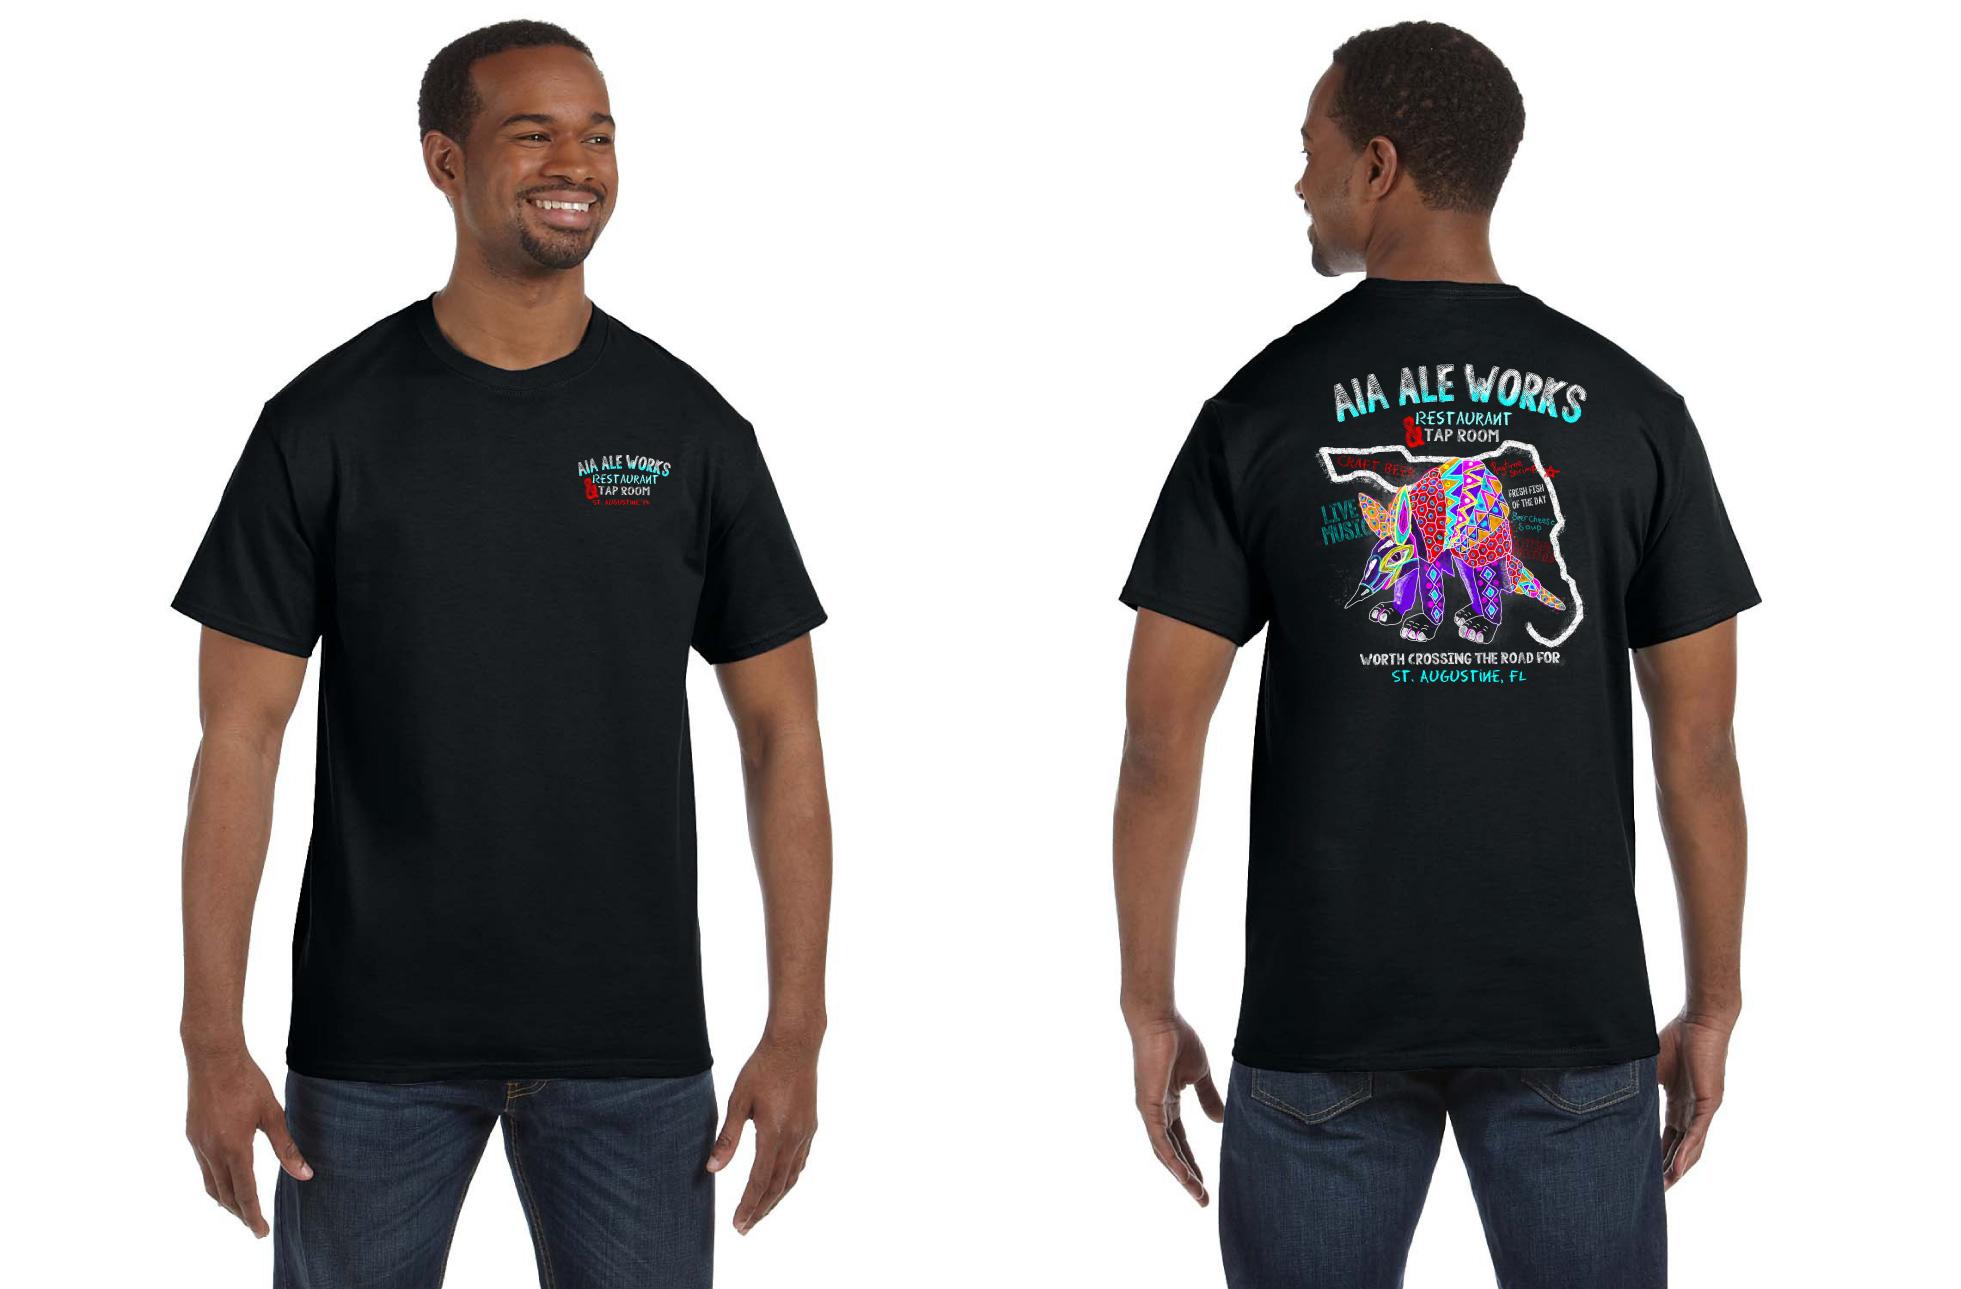 Armadillo chalk - T-shirt Proof.jpg